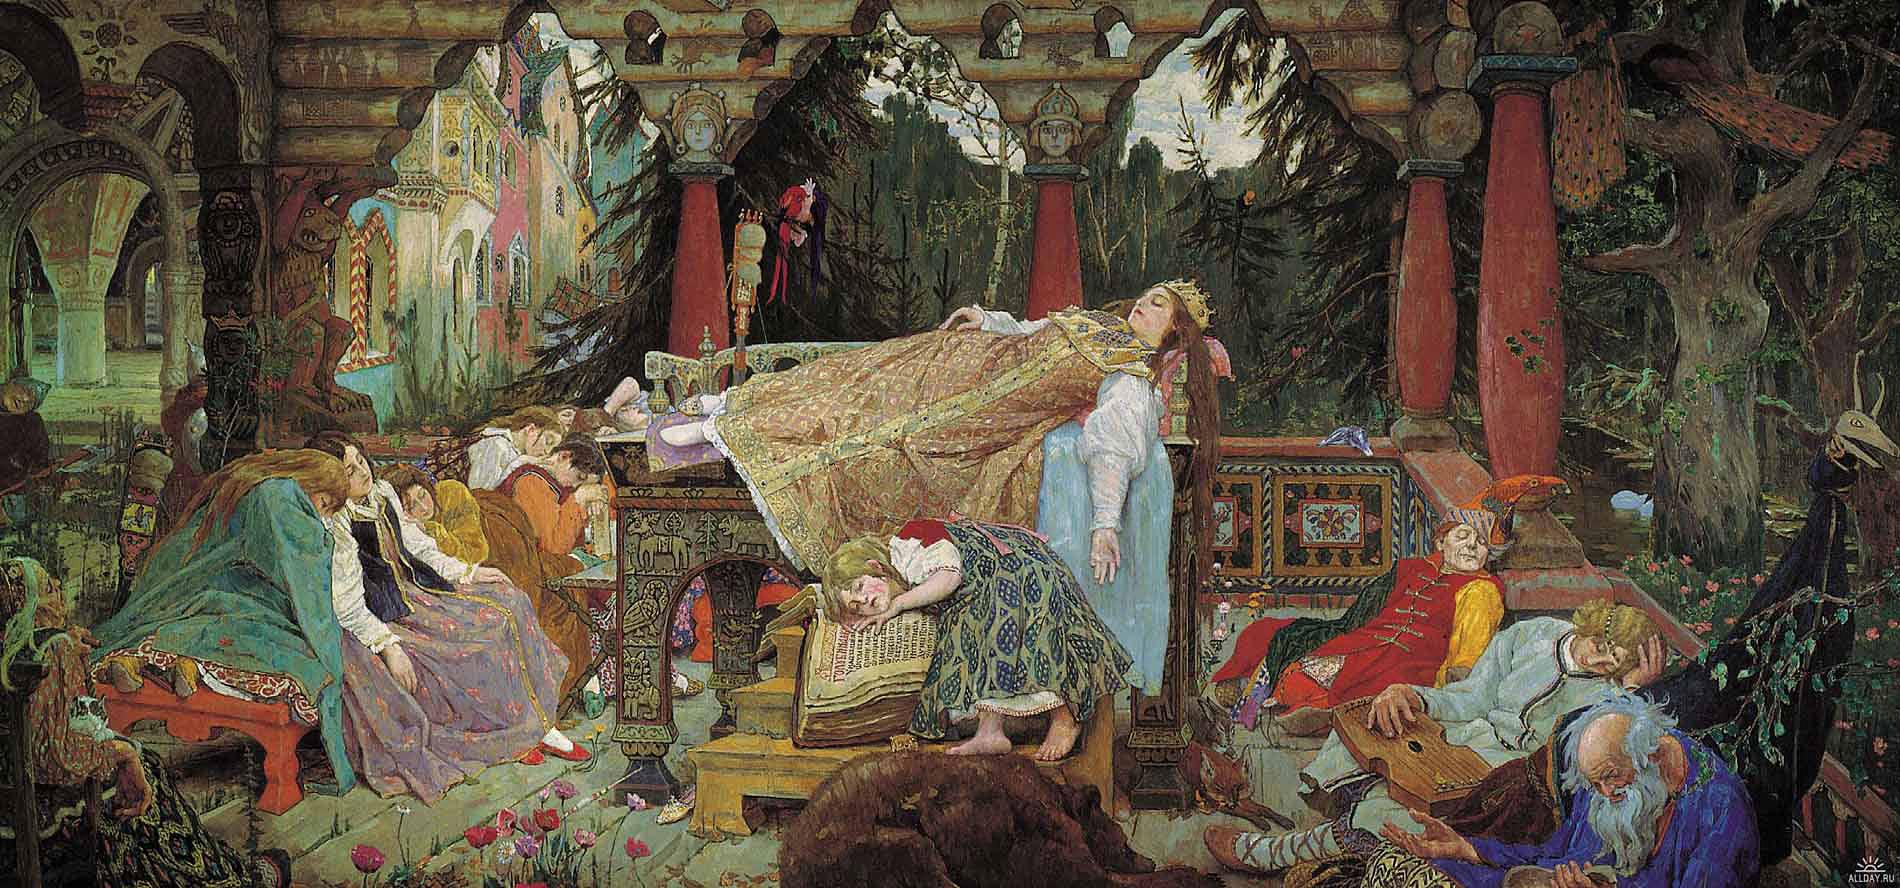 Виктор Васнецов, 1926 год, картина «Спящая царевна».